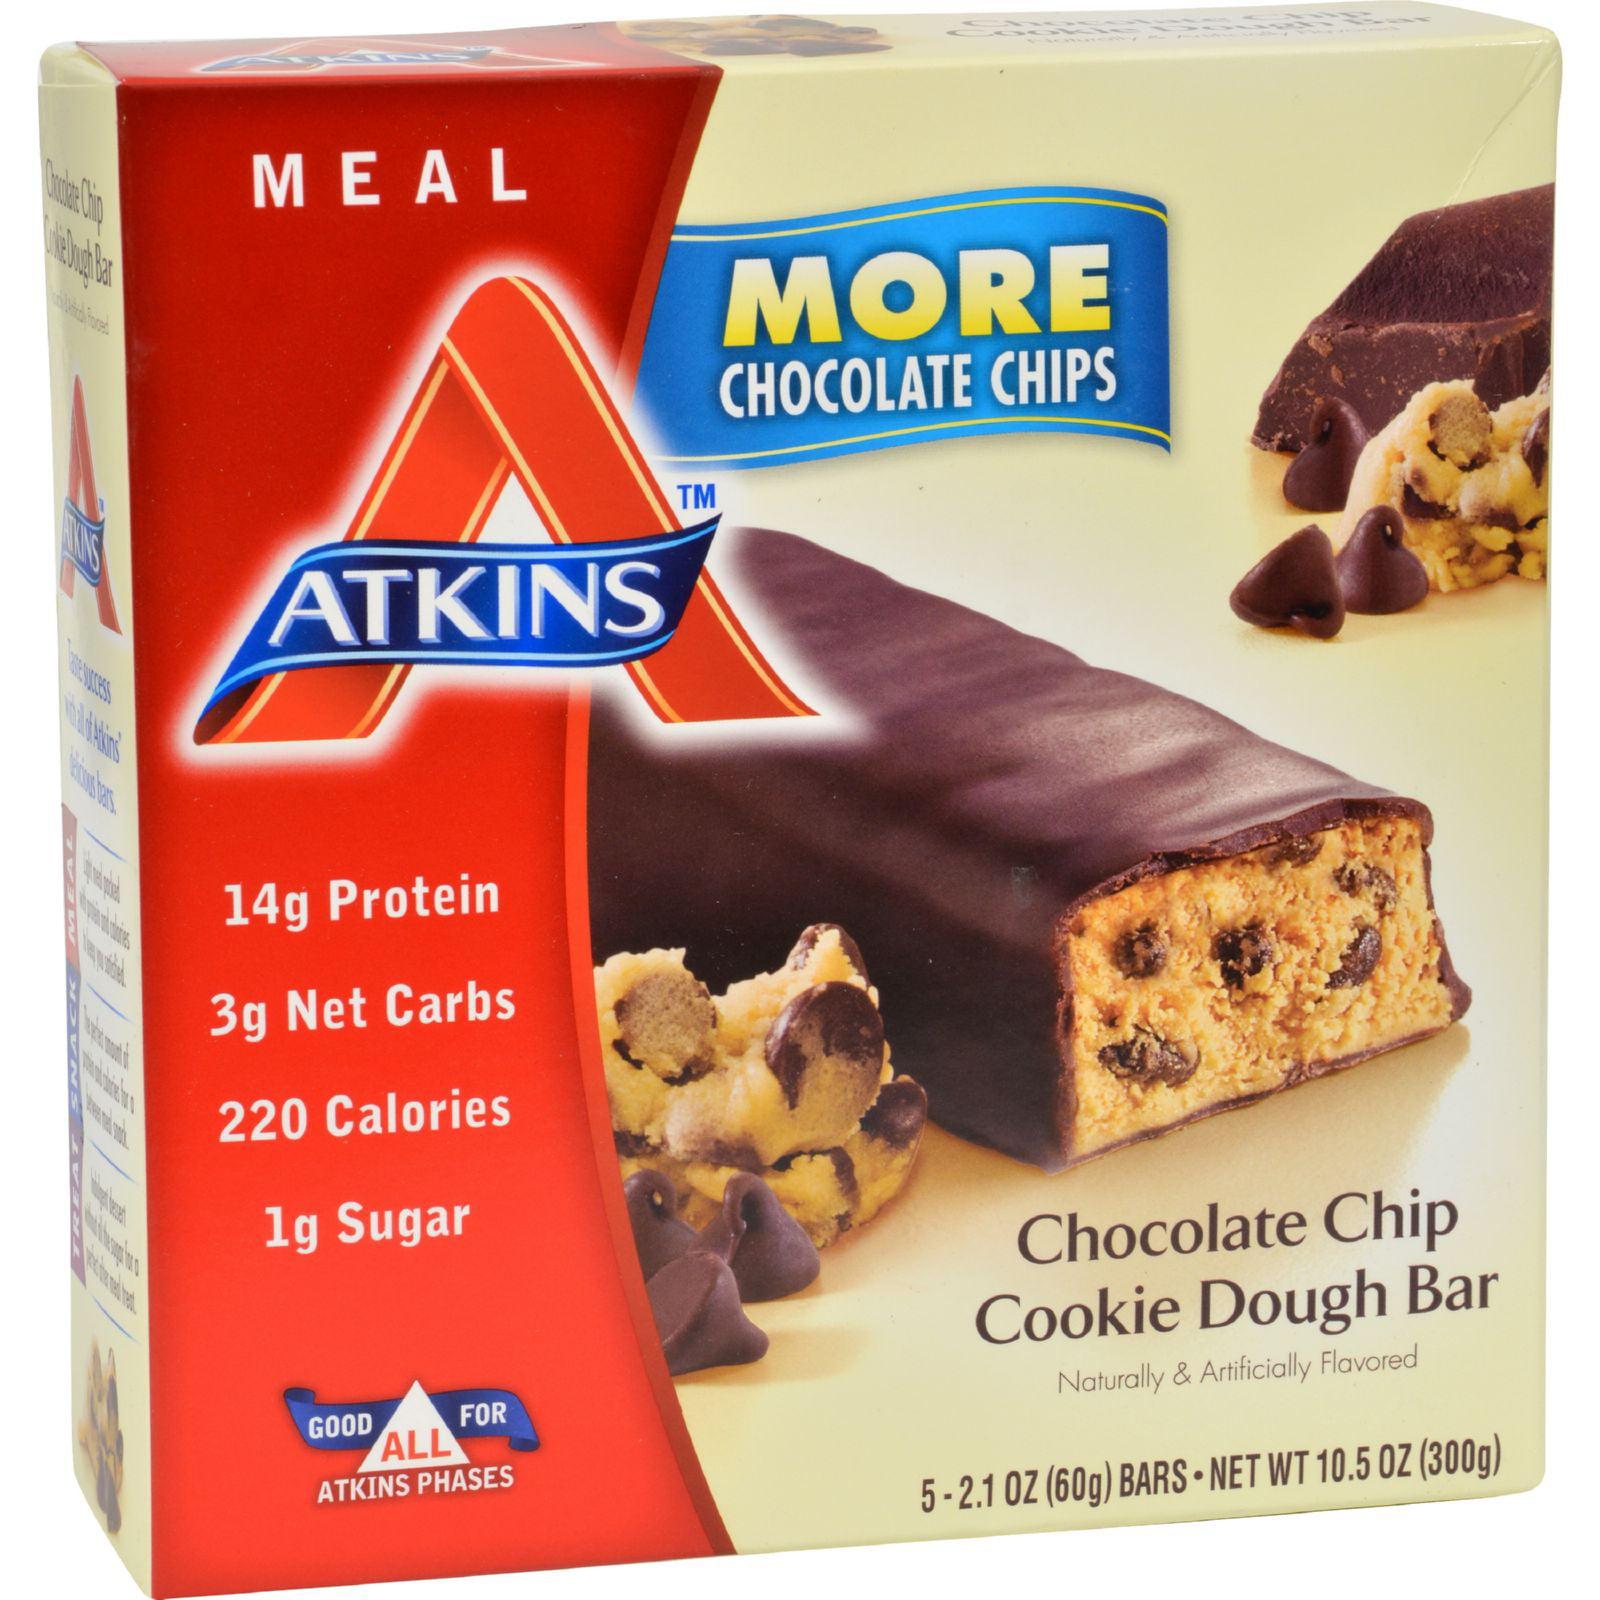 Atkins Advantage Bar Chocolate Chip Cookie Dough 5 Bars by